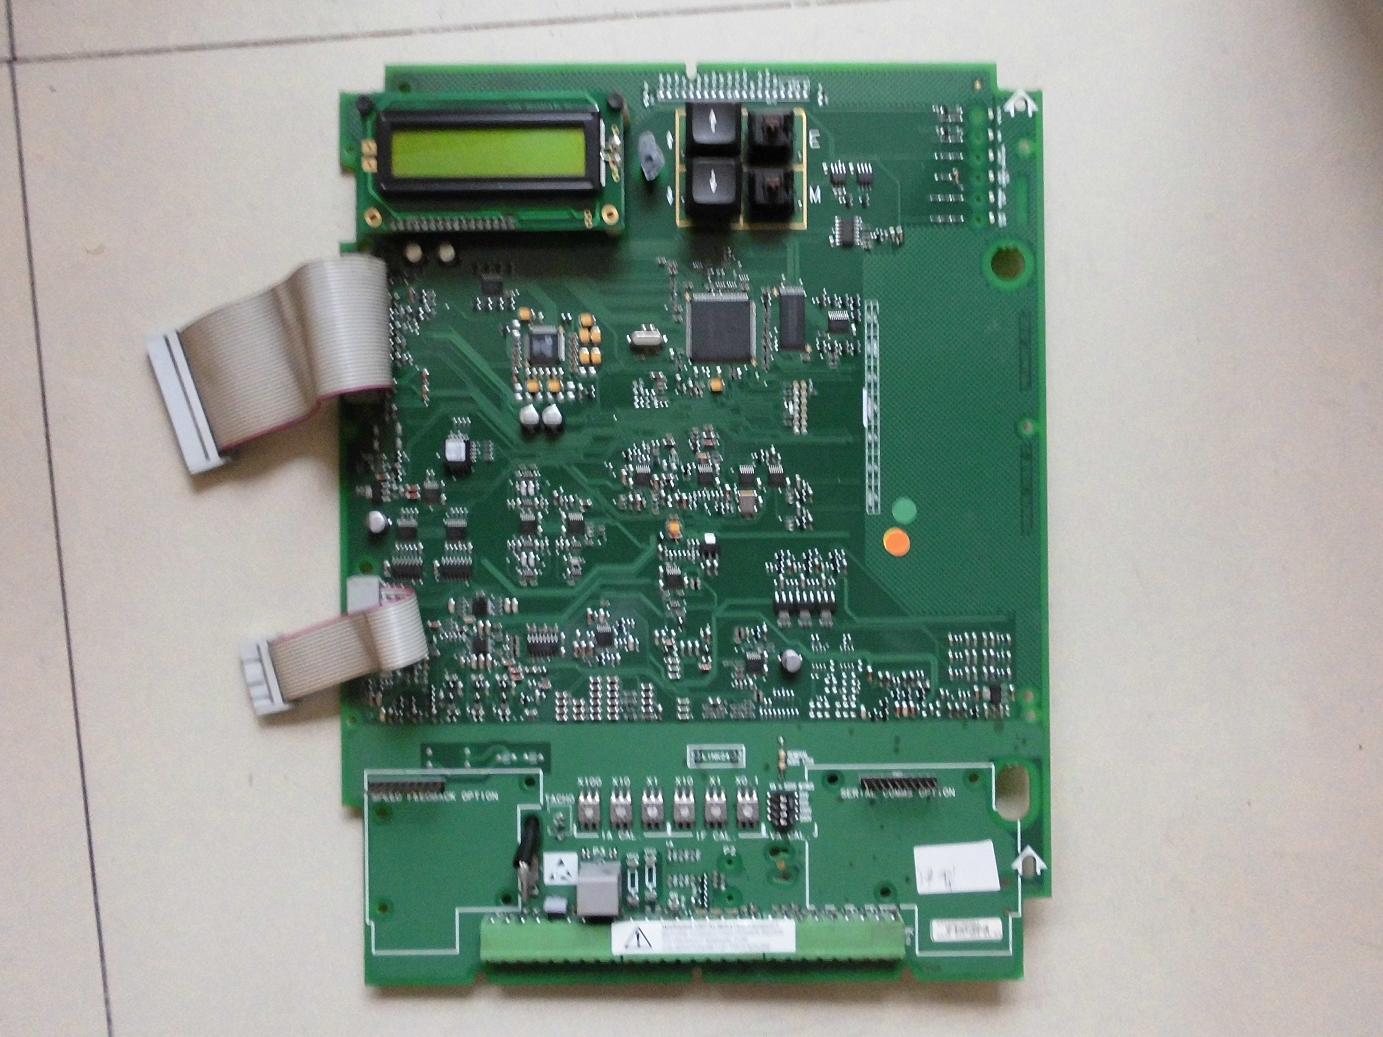 1 PC New Yaskawa Motherboard ETC740110-S1019 In Box